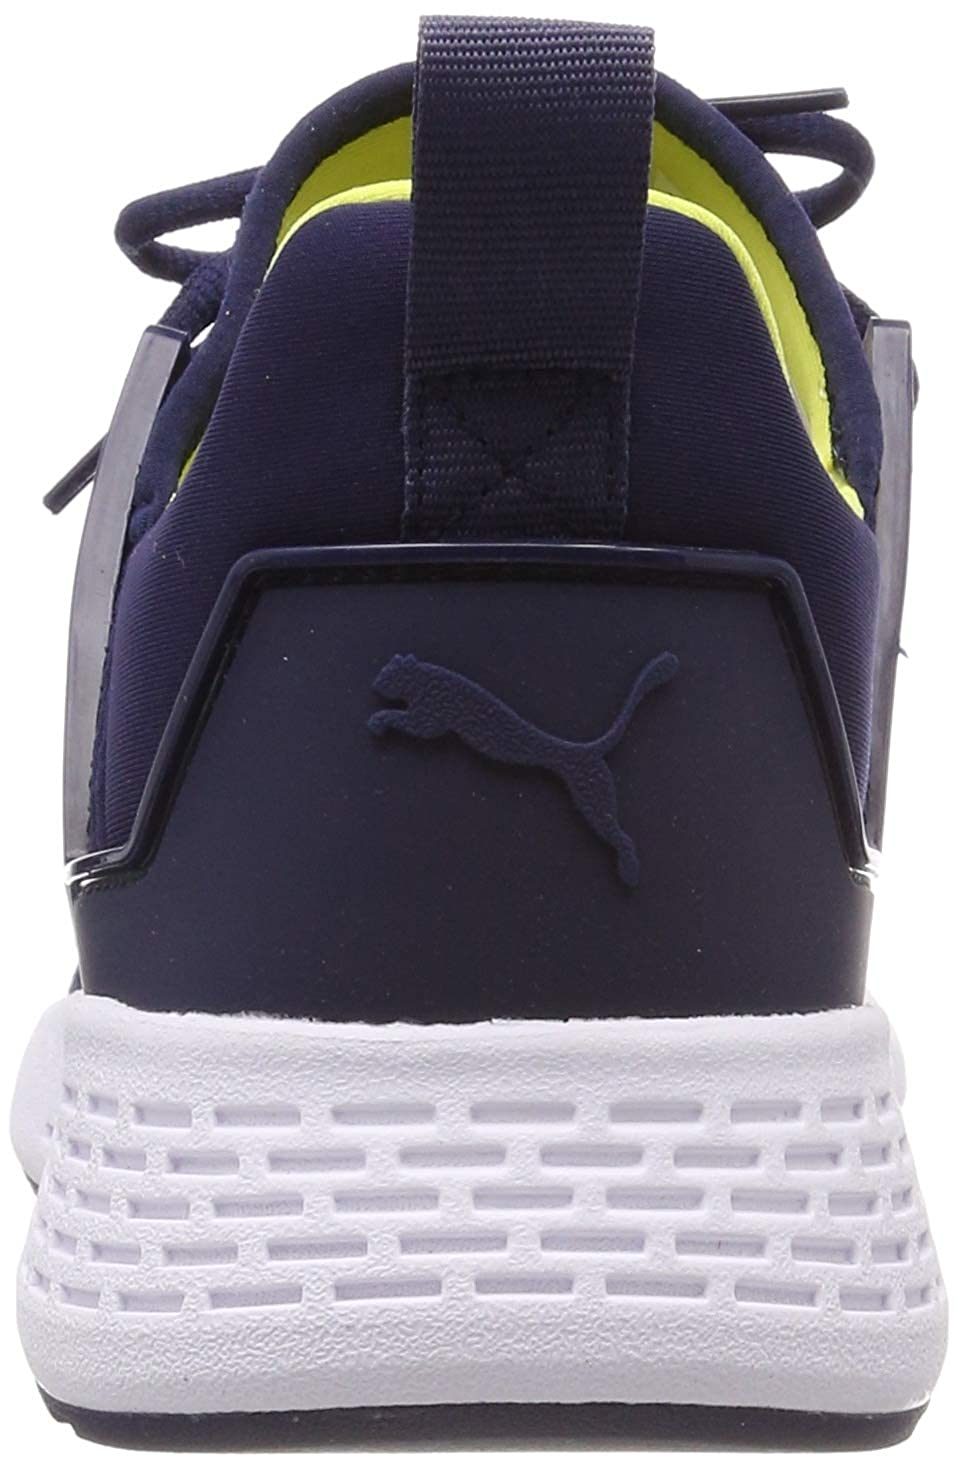 c7c5d5ef Amazon.com | PUMA Unisex Adults' Insurge Mesh Low-Top Sneakers, Blue ...